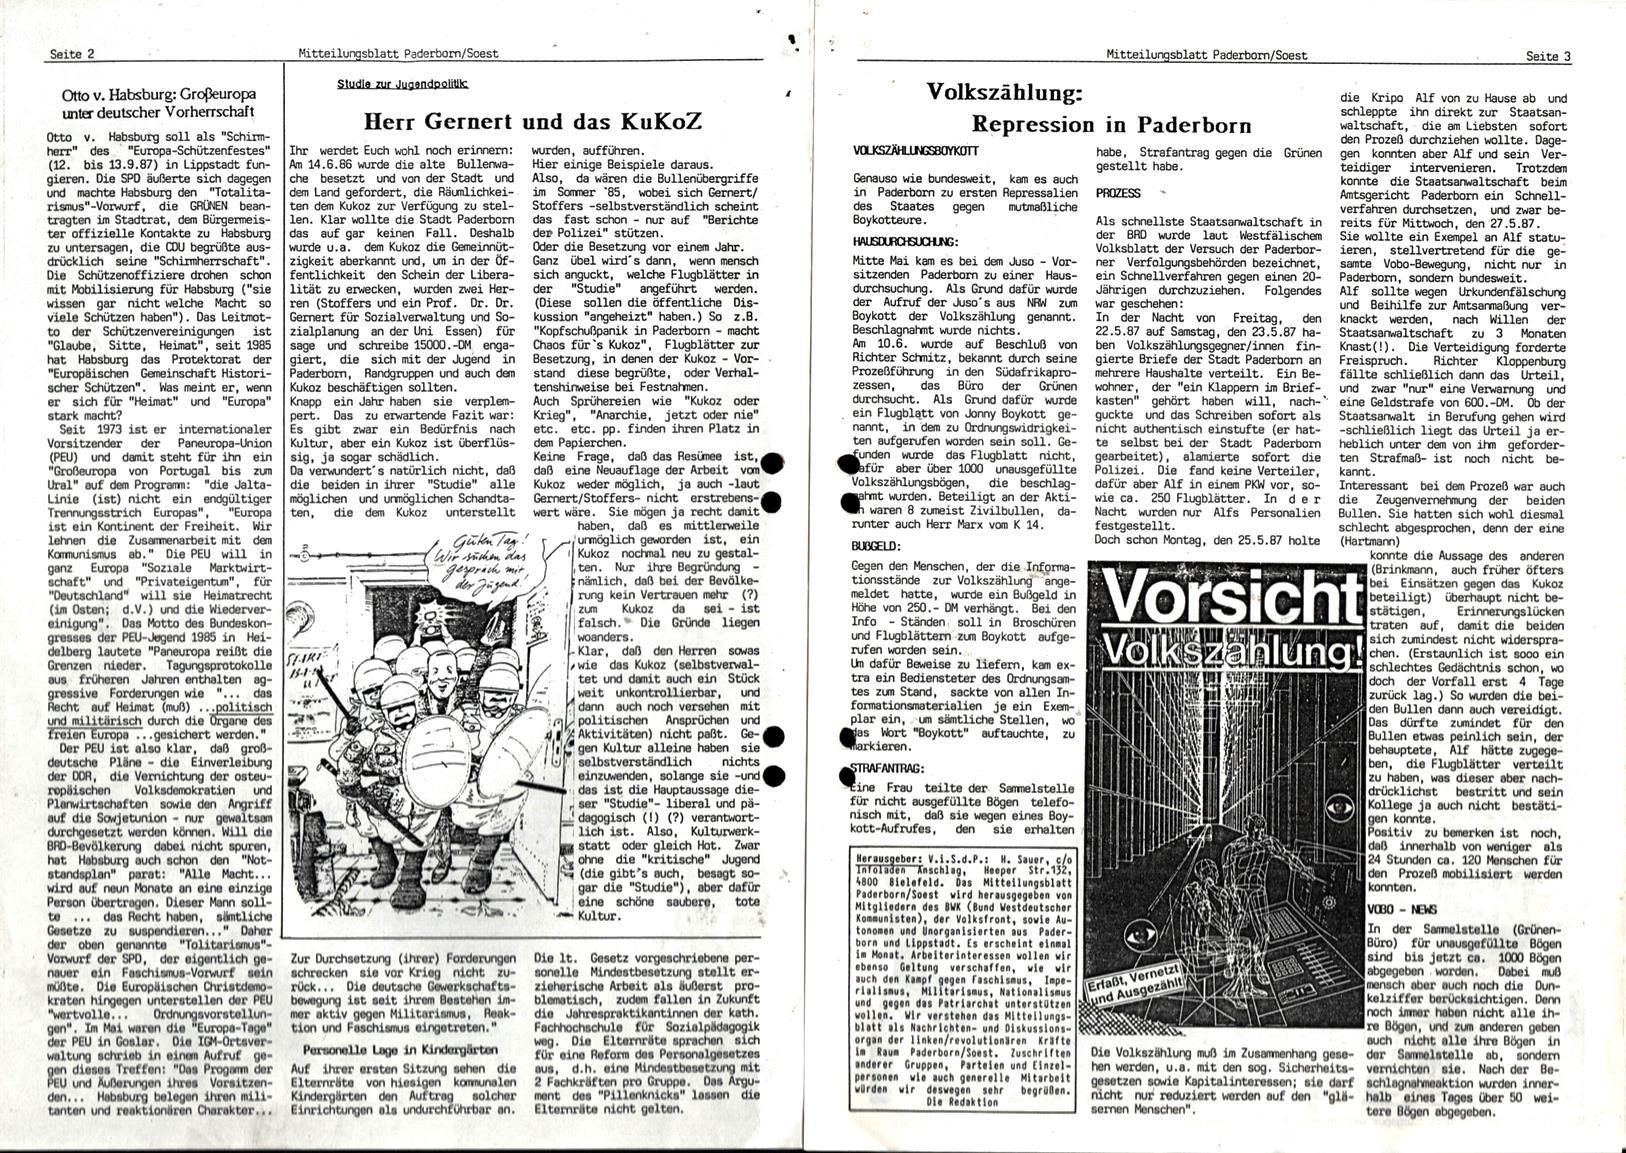 Paderborn_BWK_Mitteilungsblatt_19870615_002